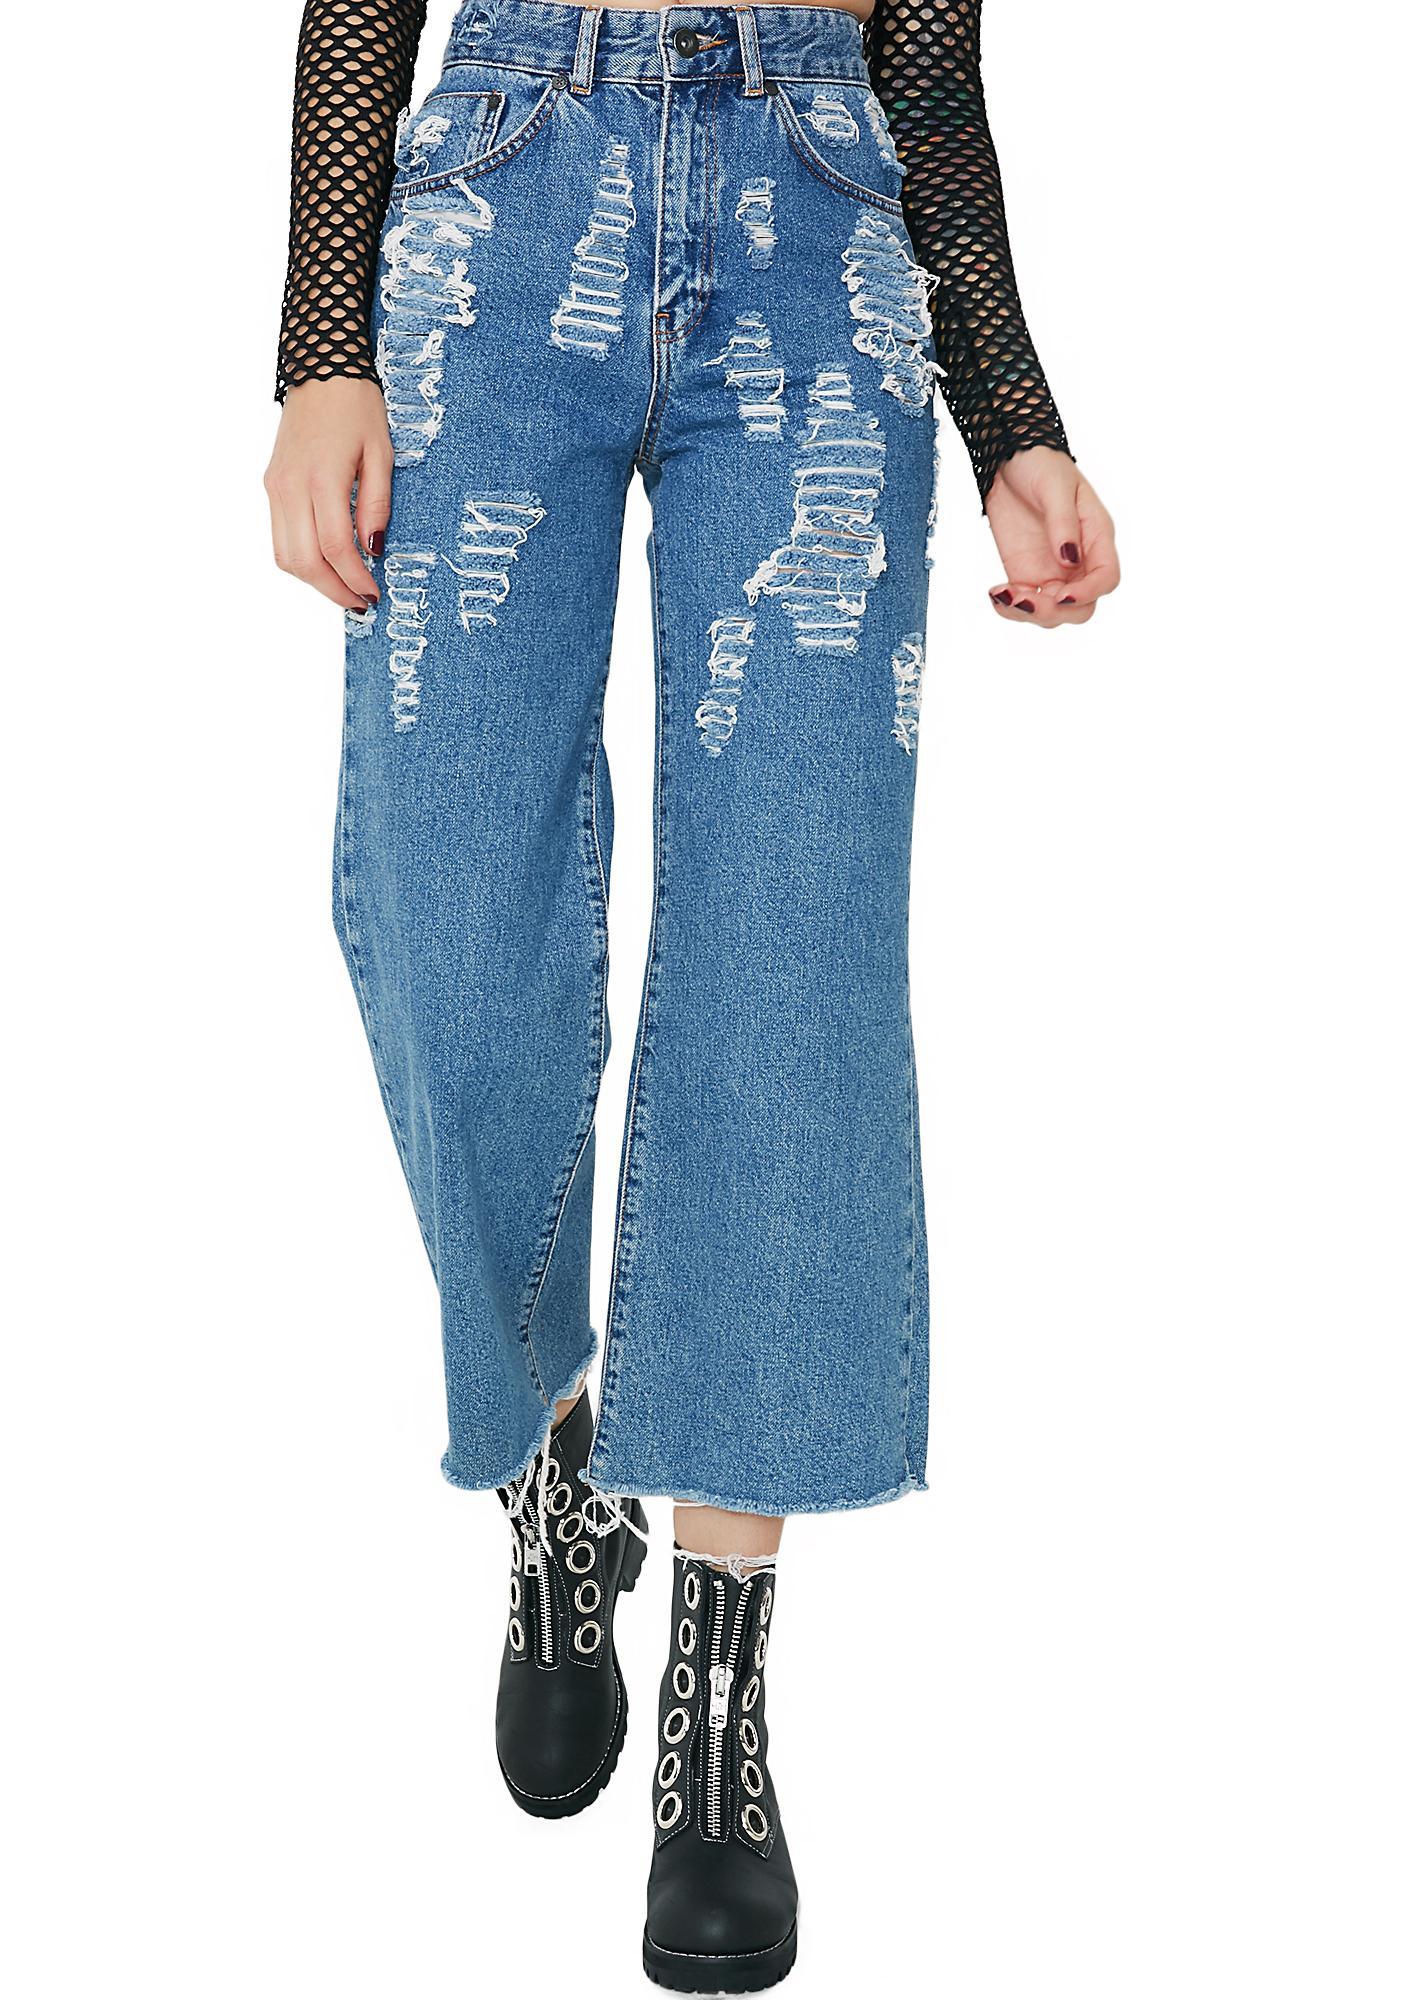 The Ragged Priest Havoc Jeans